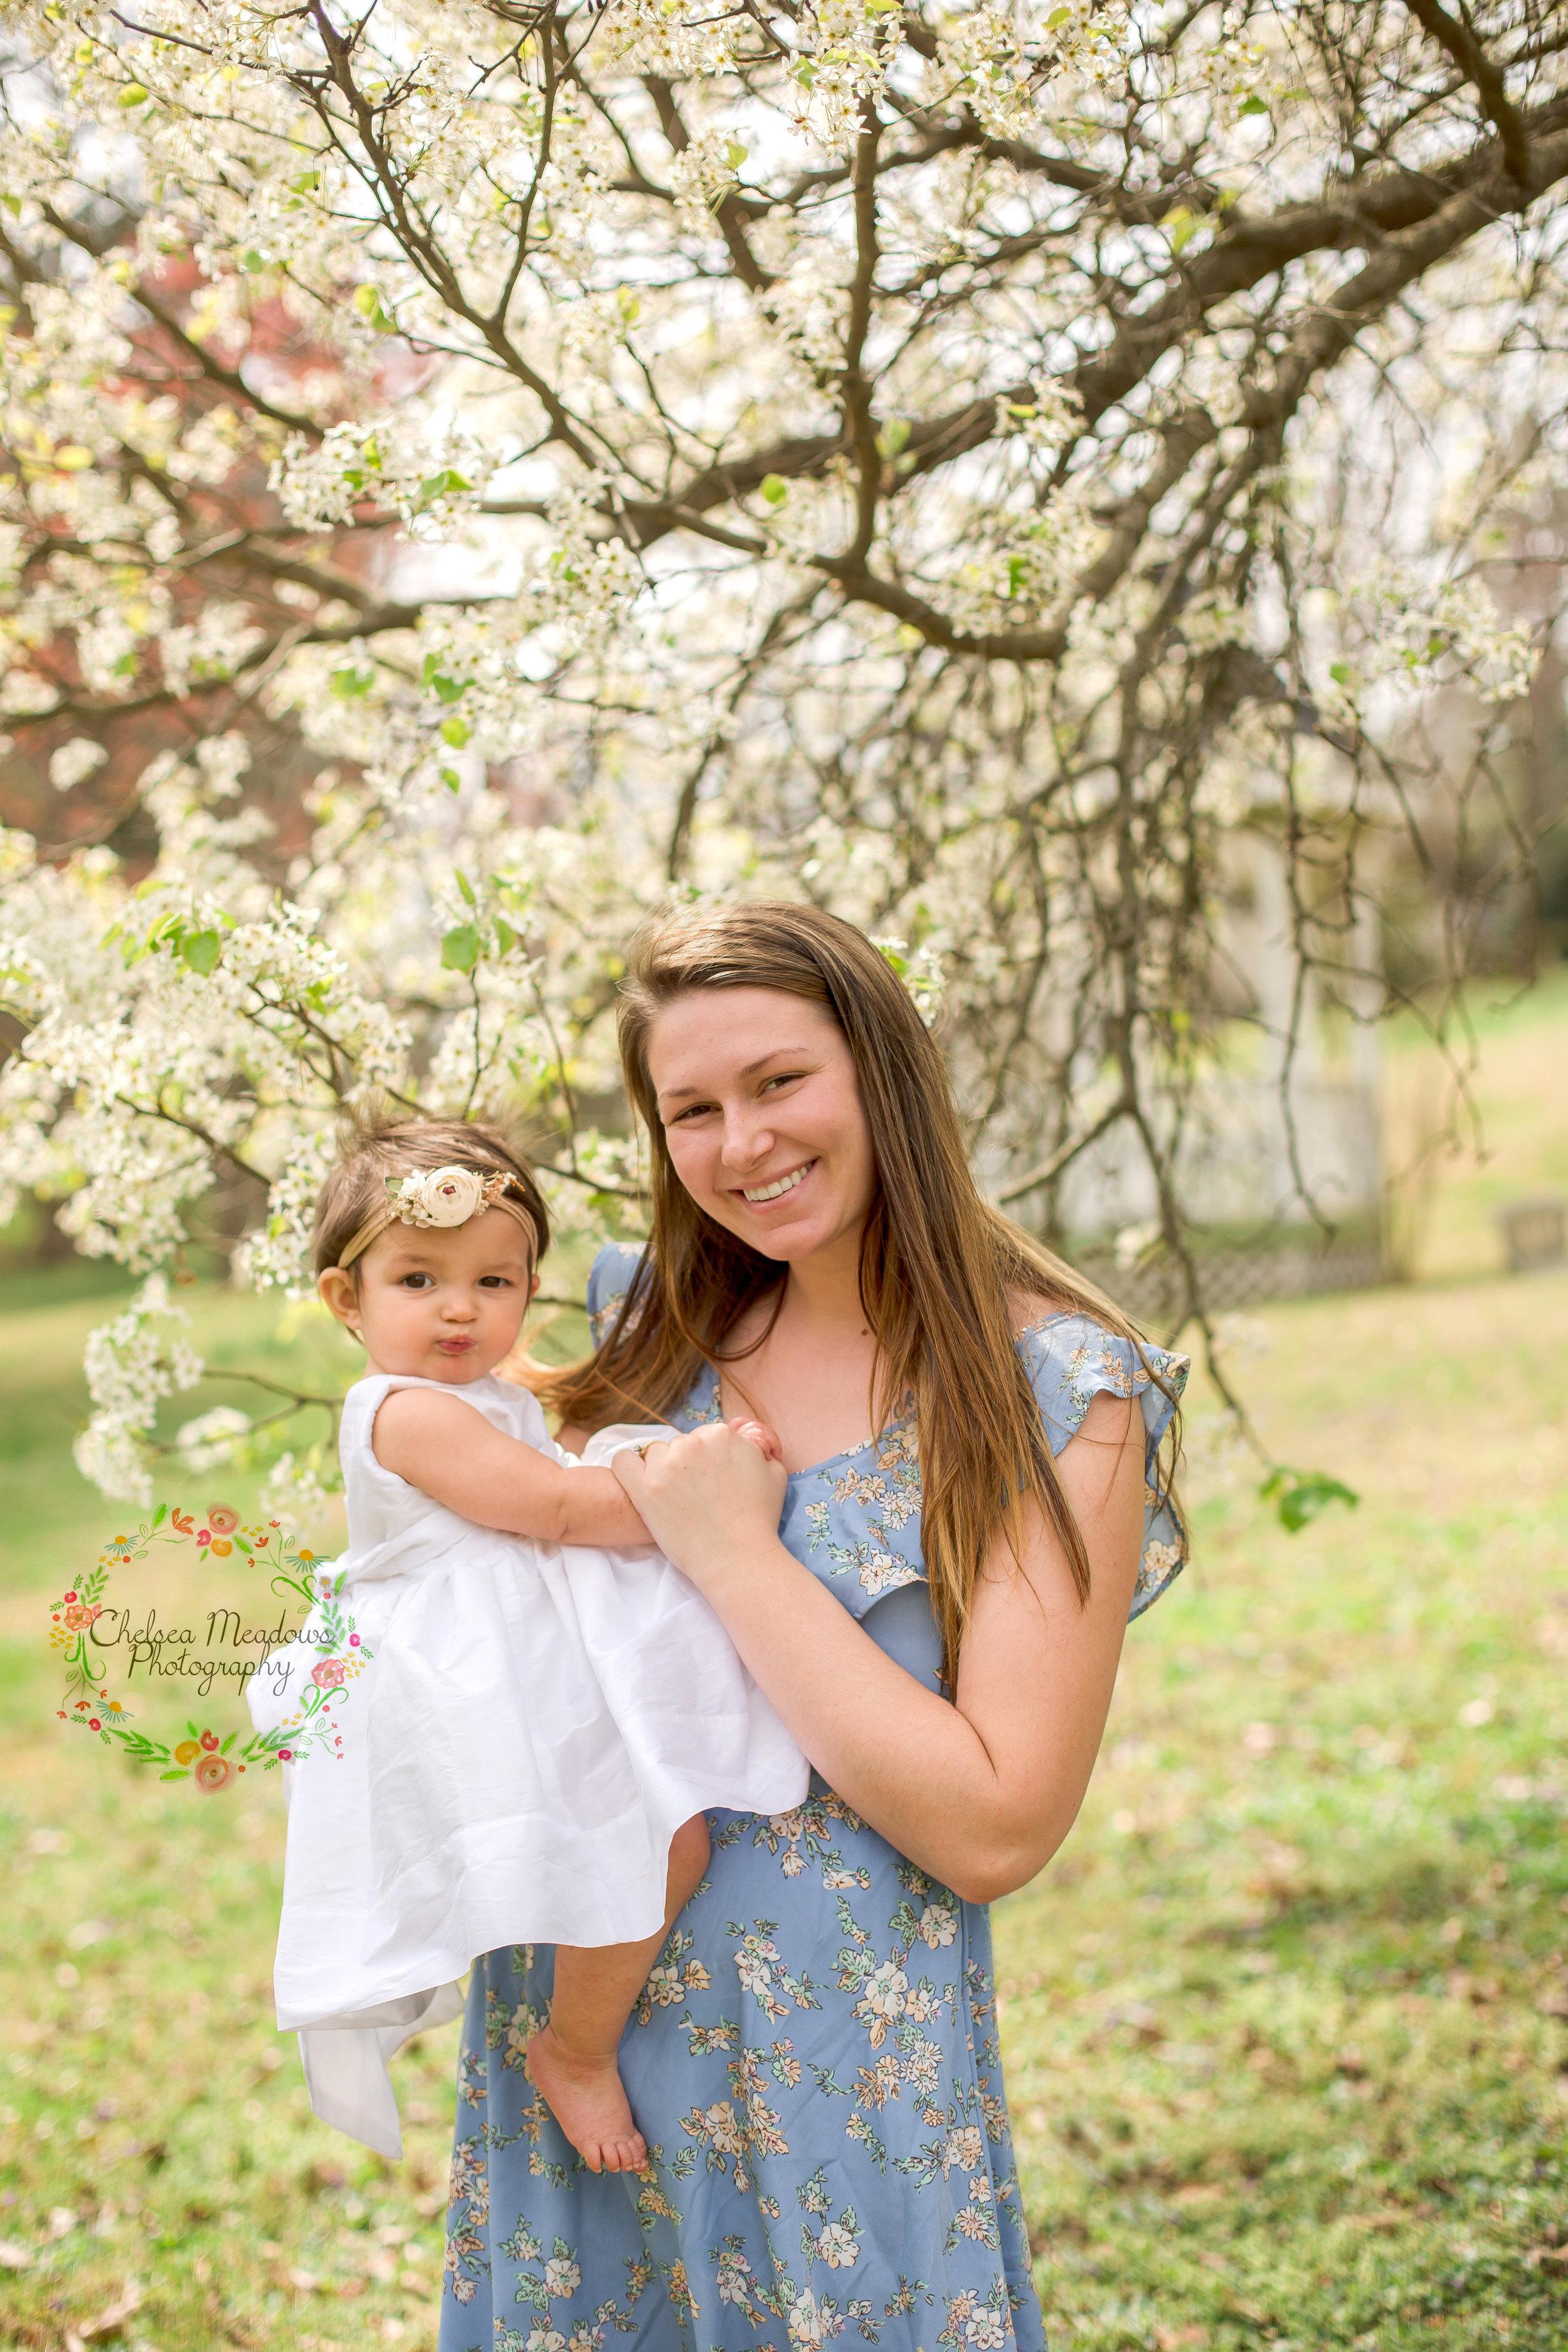 Ellis Family Spring Minis - Nashville Family Photographer - Chelsea Meadows Photography (13)_edited-1.jpg